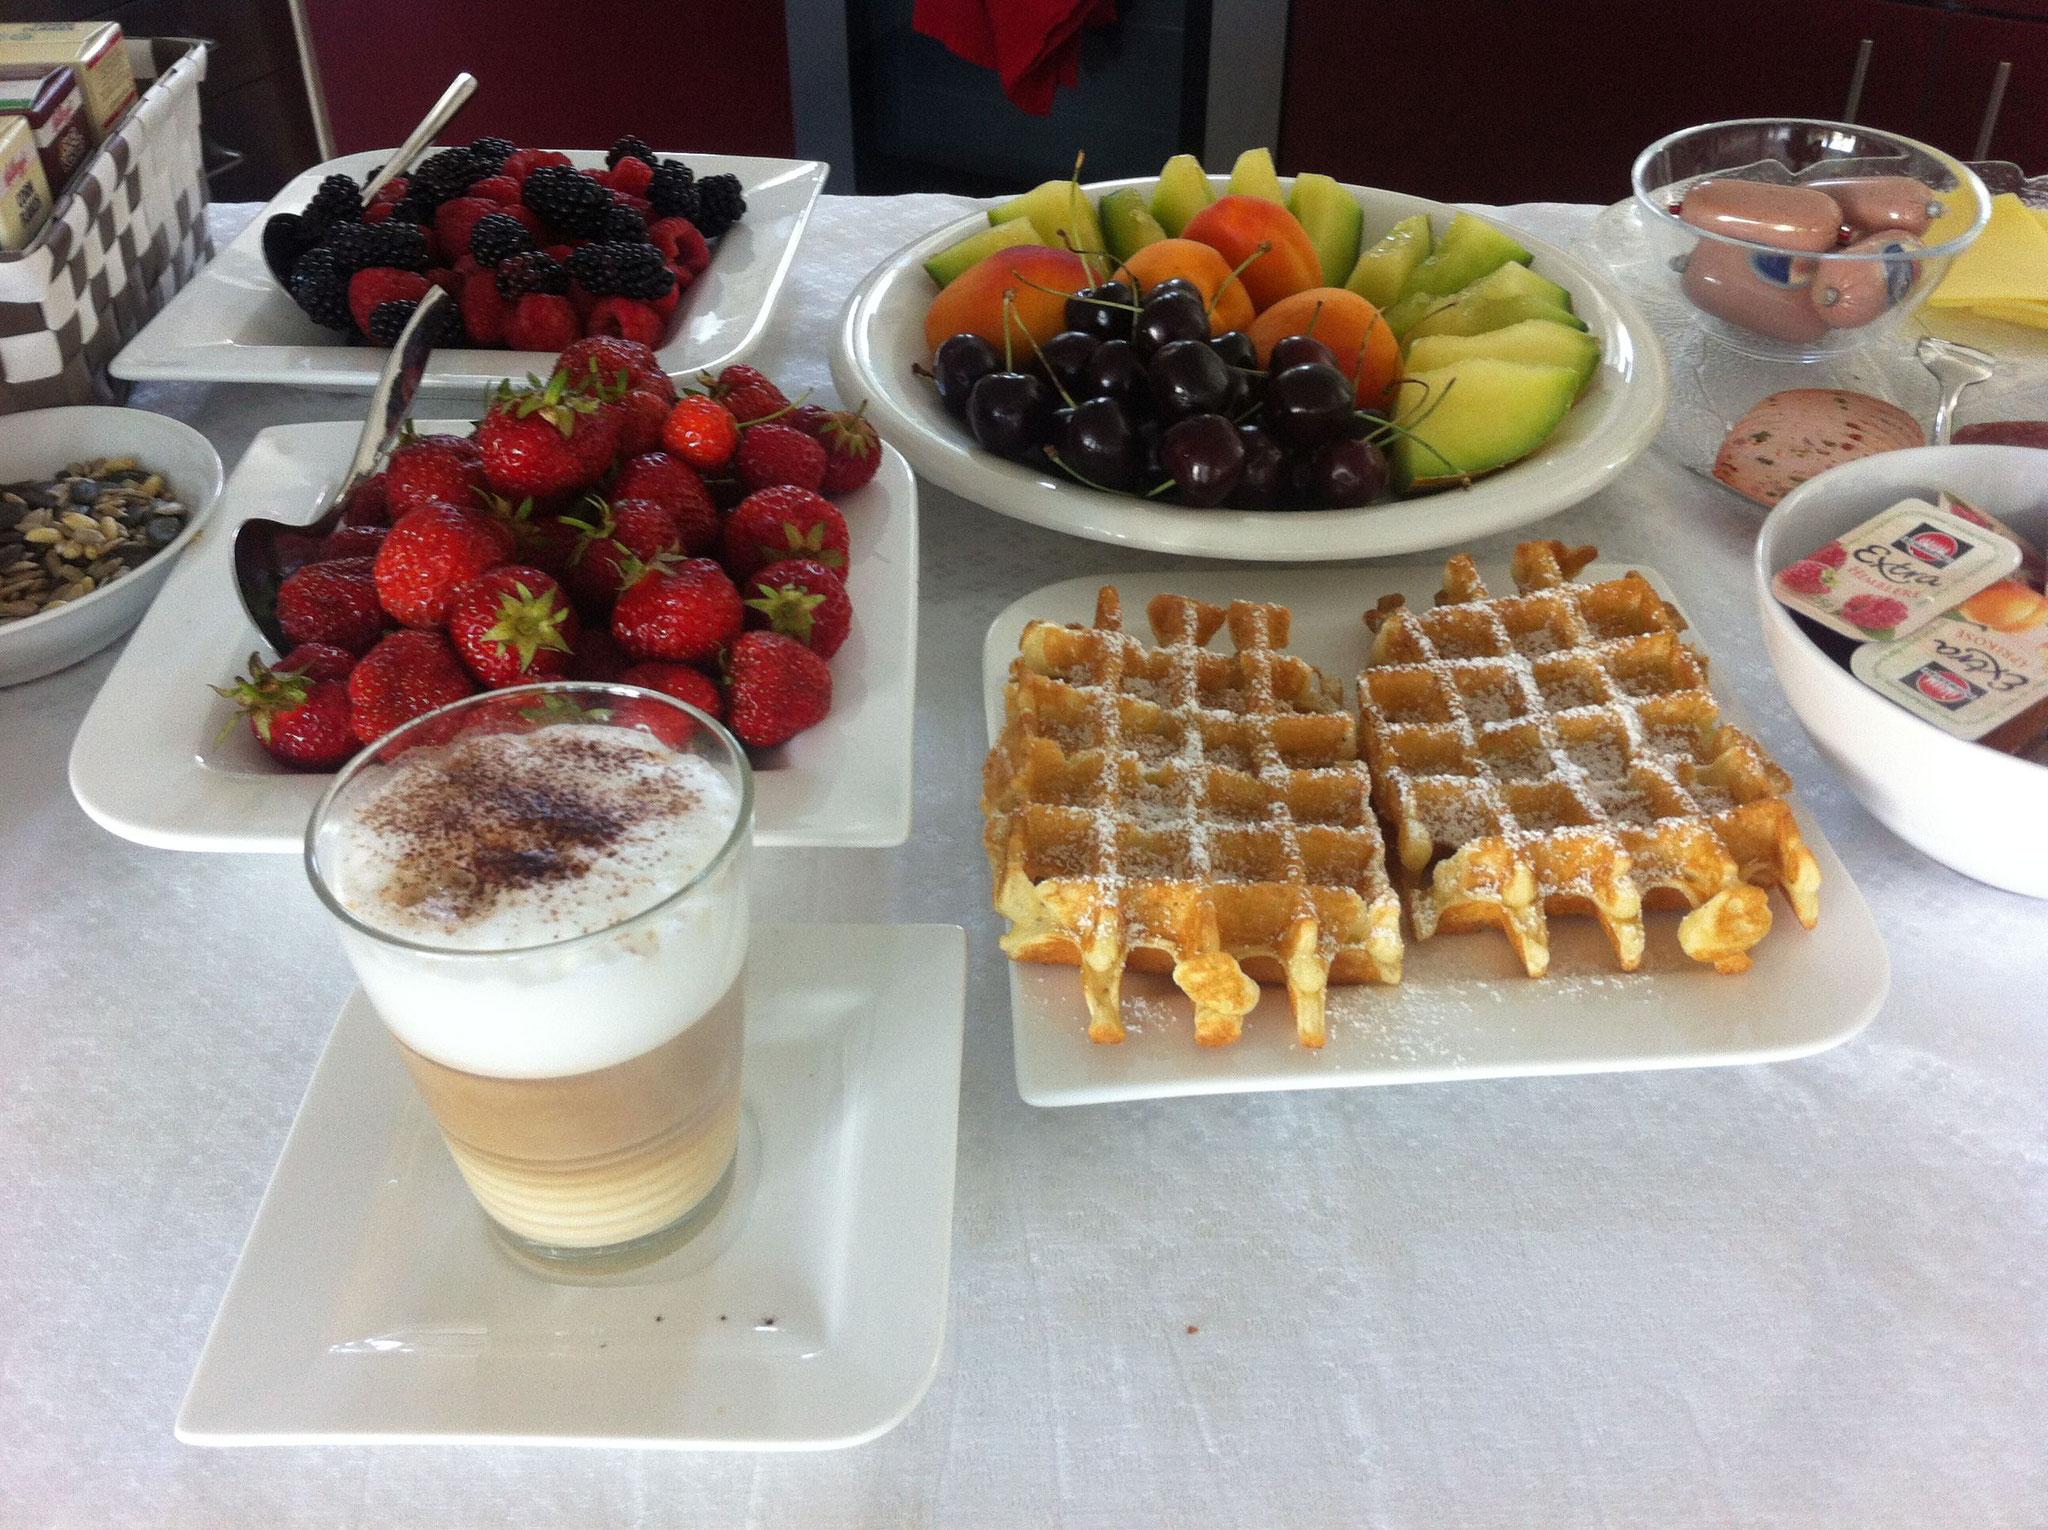 Gemeinsames Frühstück